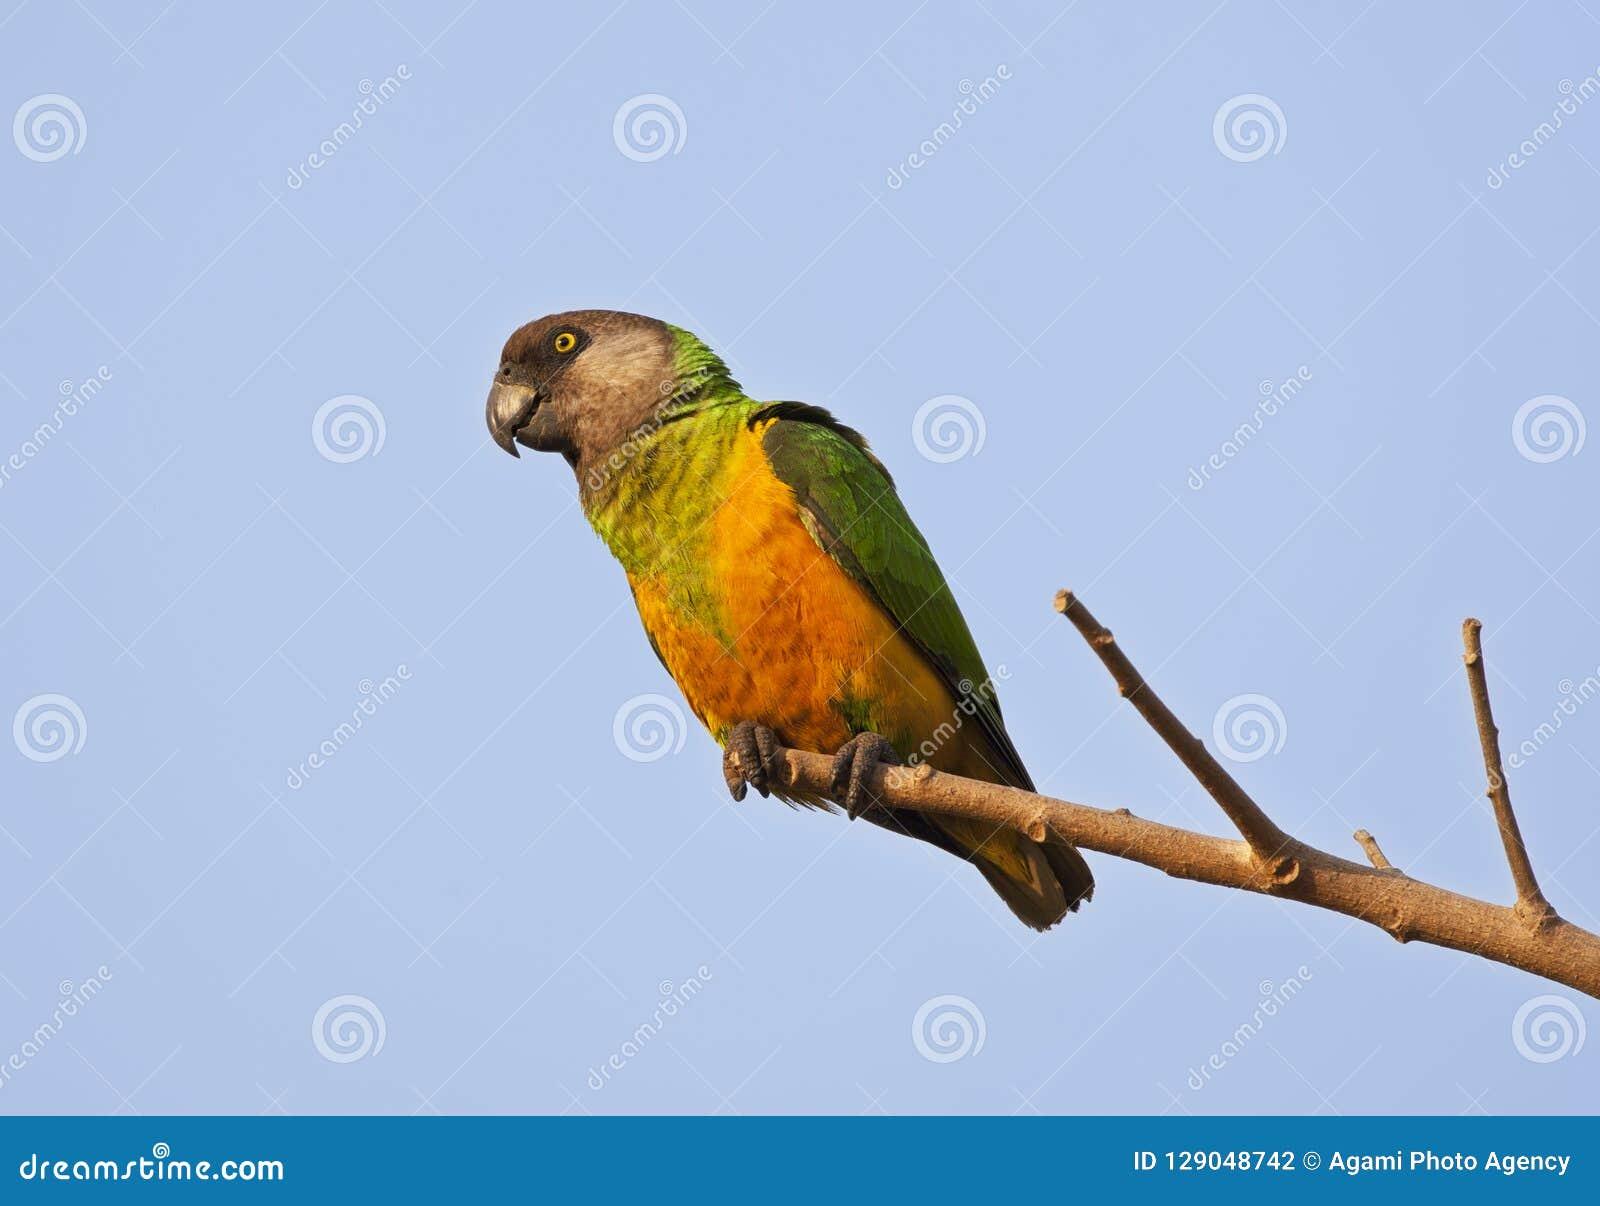 Bonte Boertje, Senegal Parrot, Poicephalus senegalus